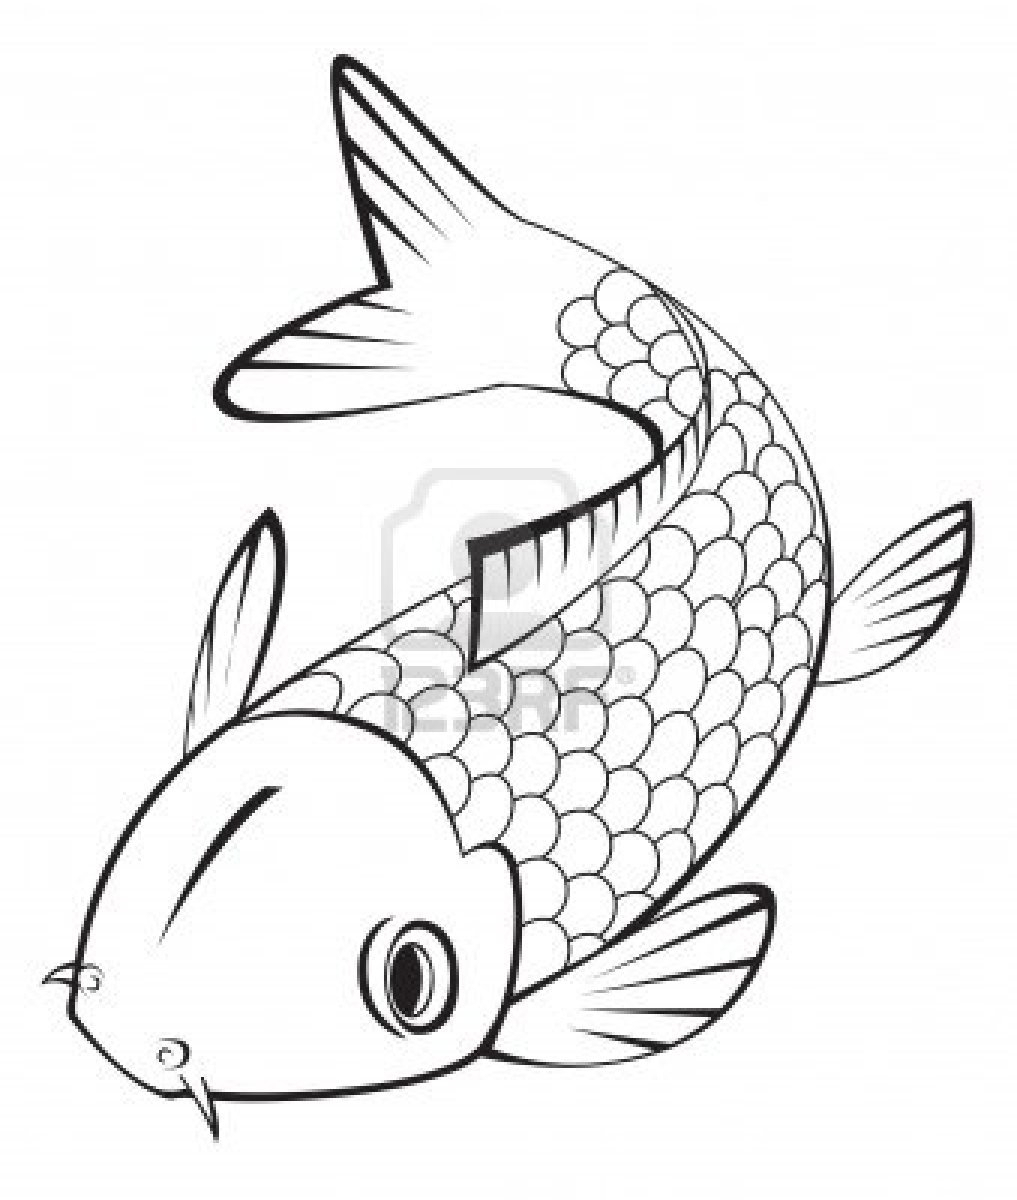 1017x1200 Simple Koi Fish Drawing Koi Fish Clipart Line Drawing